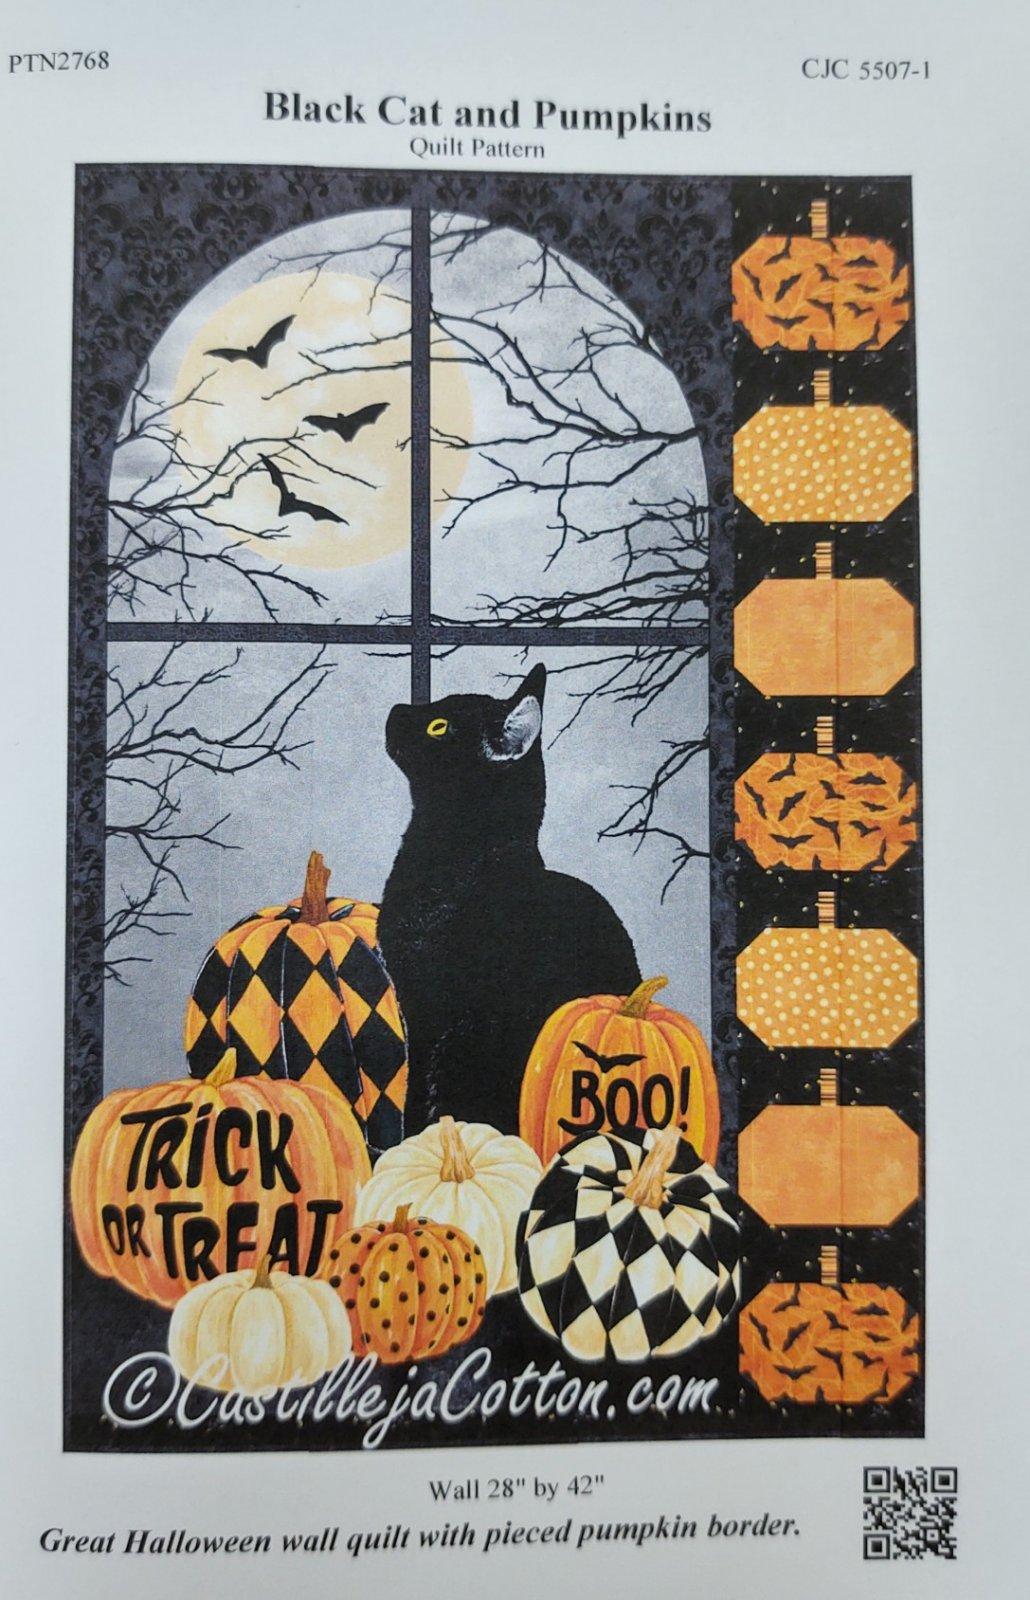 Black Cat & Pumpkins Wall Quilt Kit